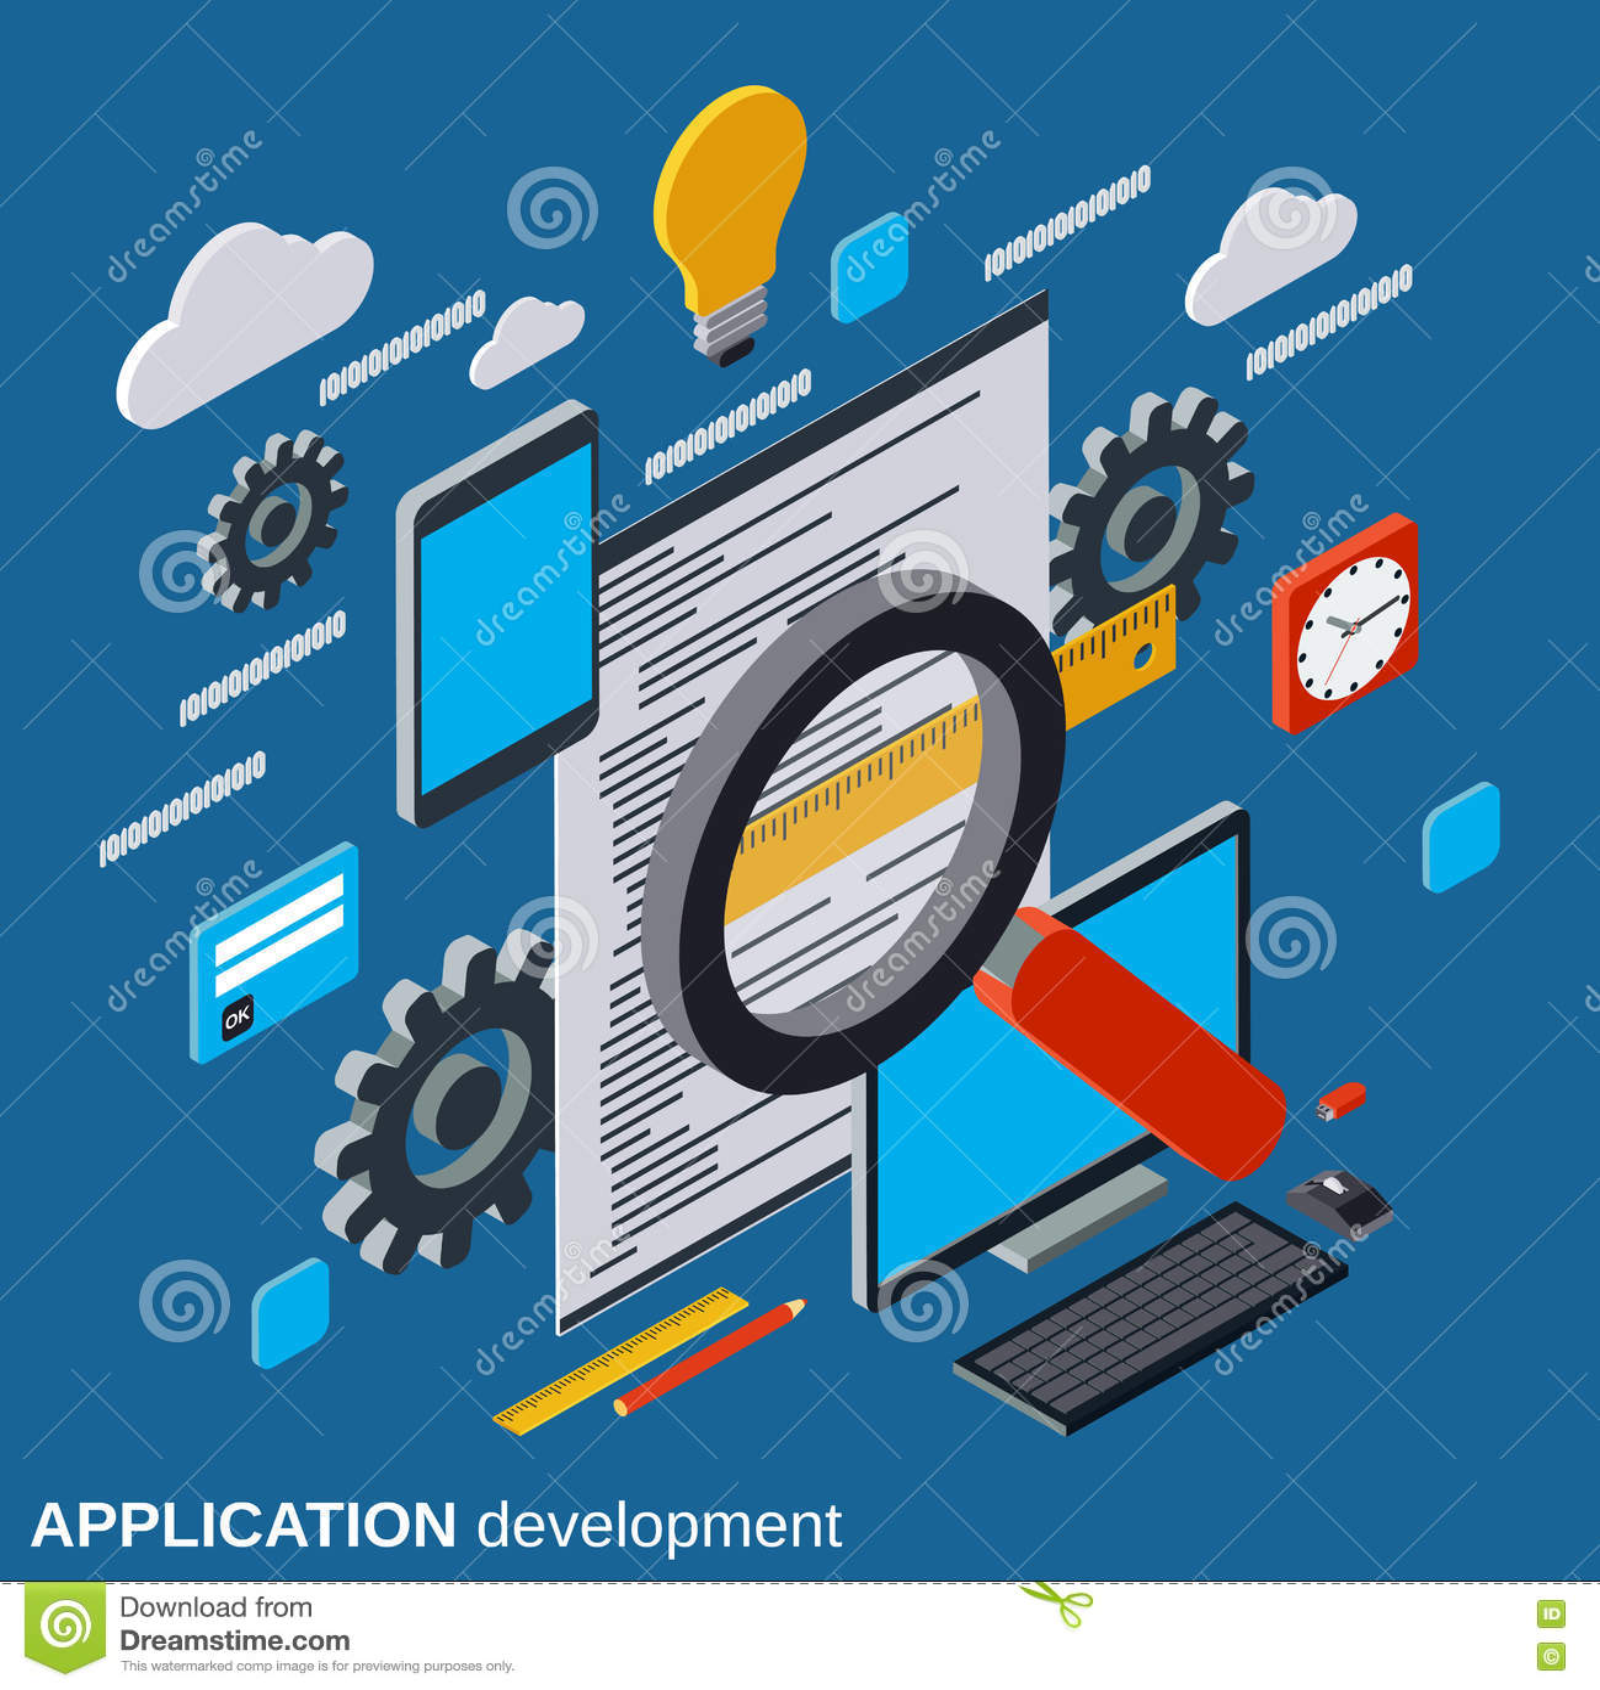 regression testing tools for desktop application